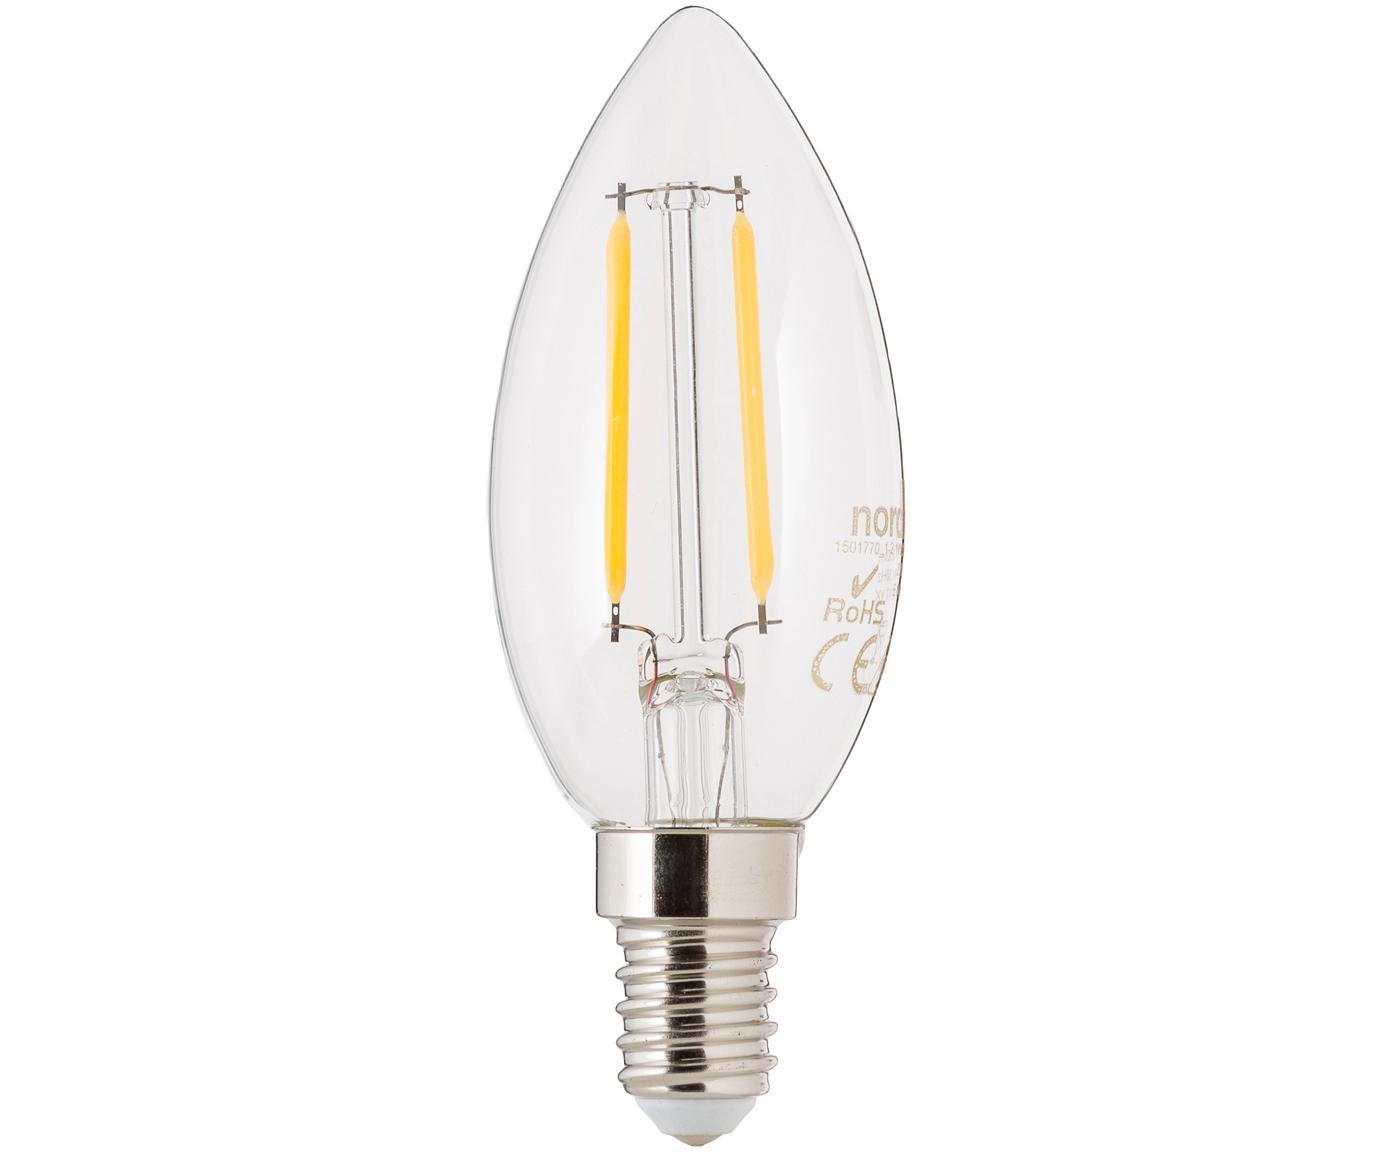 LED Leuchtmittel Vel (E14/2W), Leuchtmittelschirm: Glas, Leuchtmittelfassung: Aluminium, Transparent, Ø 4 x H 10 cm